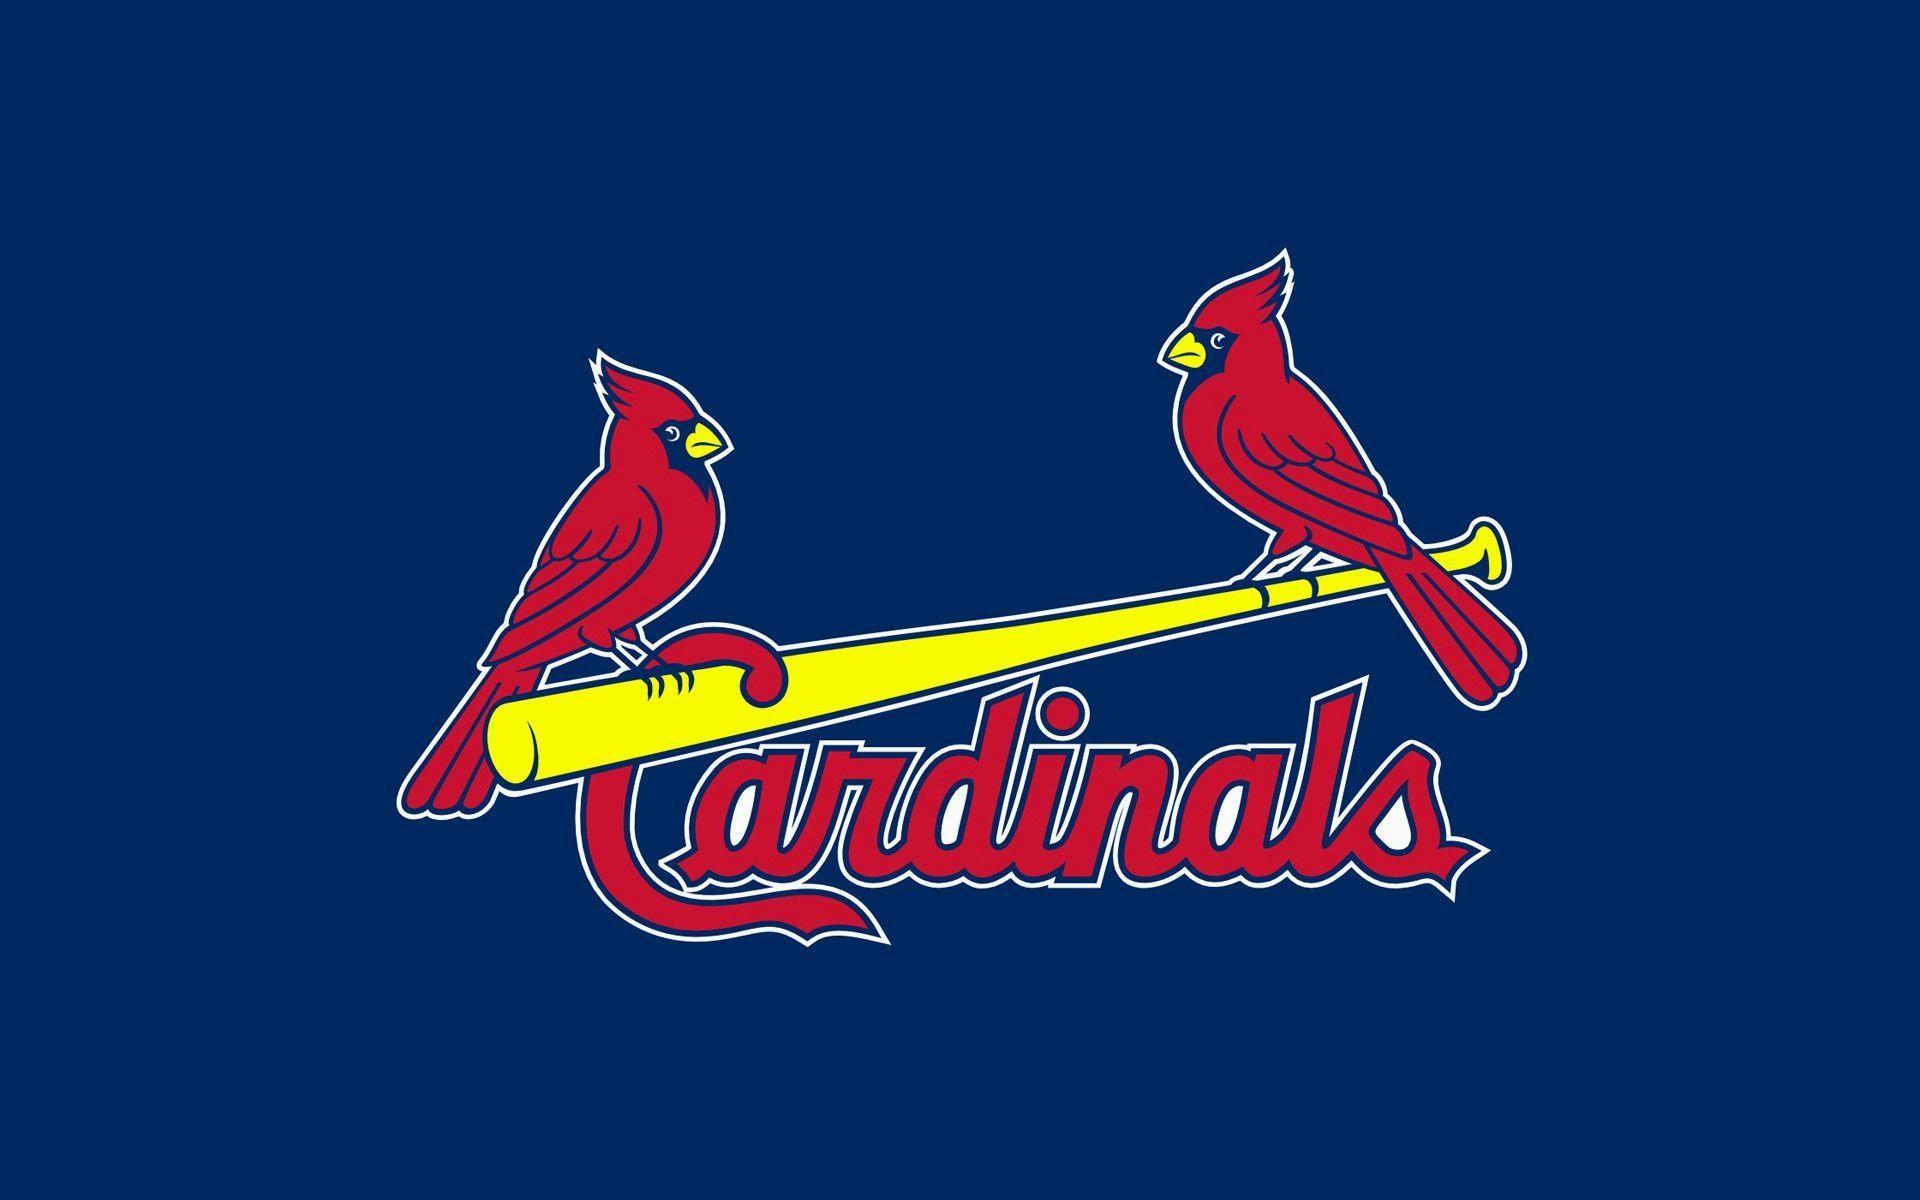 ST-Louis-Cardinals-Logo-Backgrounds-Free-Download